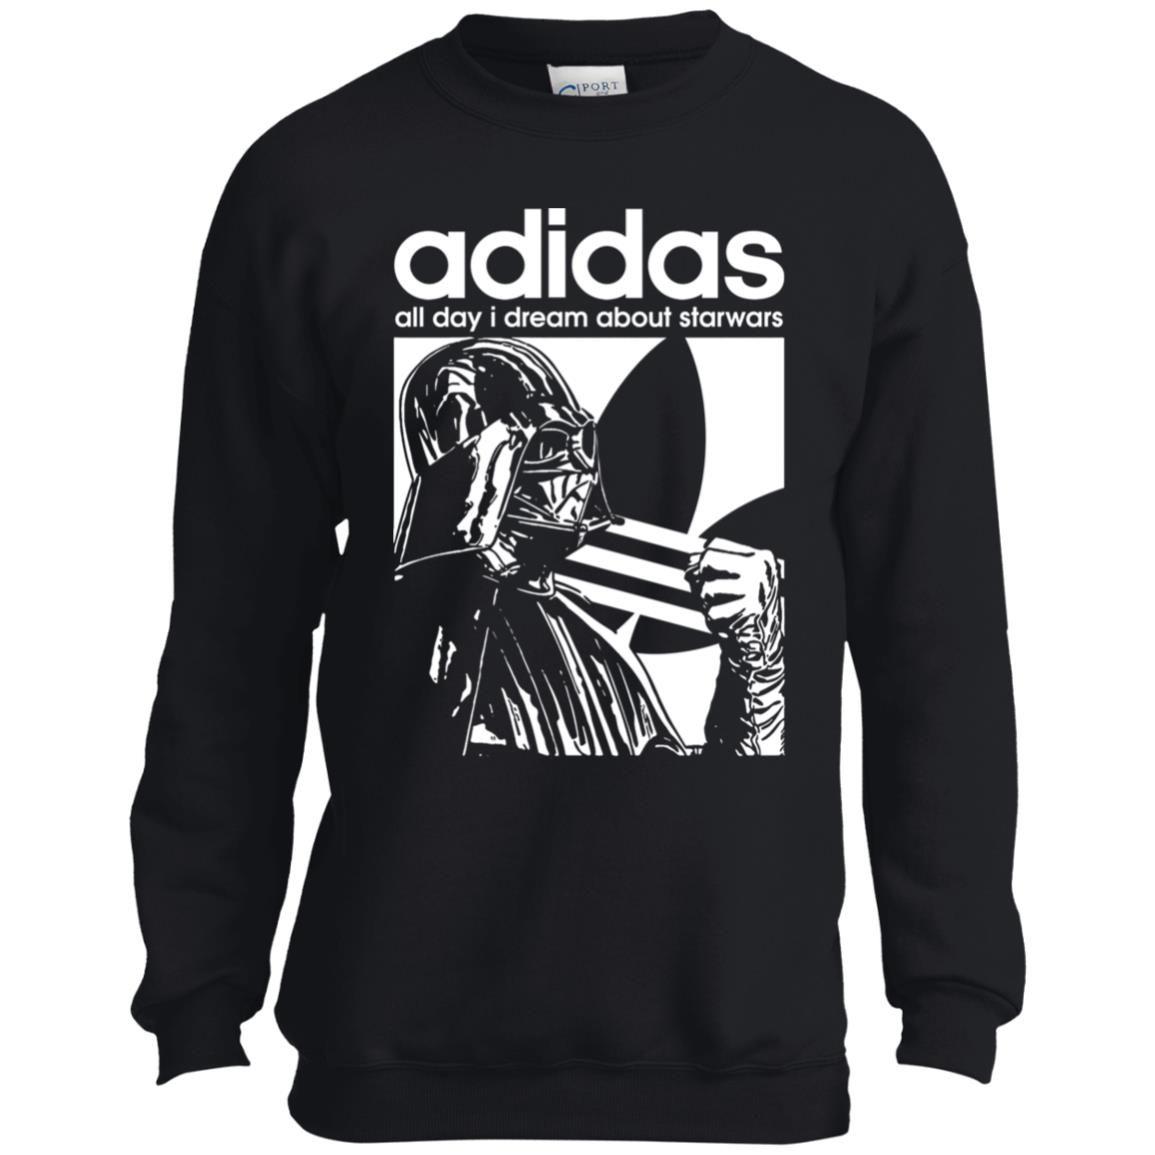 Star Wars Adidas Darth Vader Youth Kids Sweatshirt Zamrie Sweatshirts Kids Sweatshirt Youth Sweatshirts [ 1155 x 1155 Pixel ]